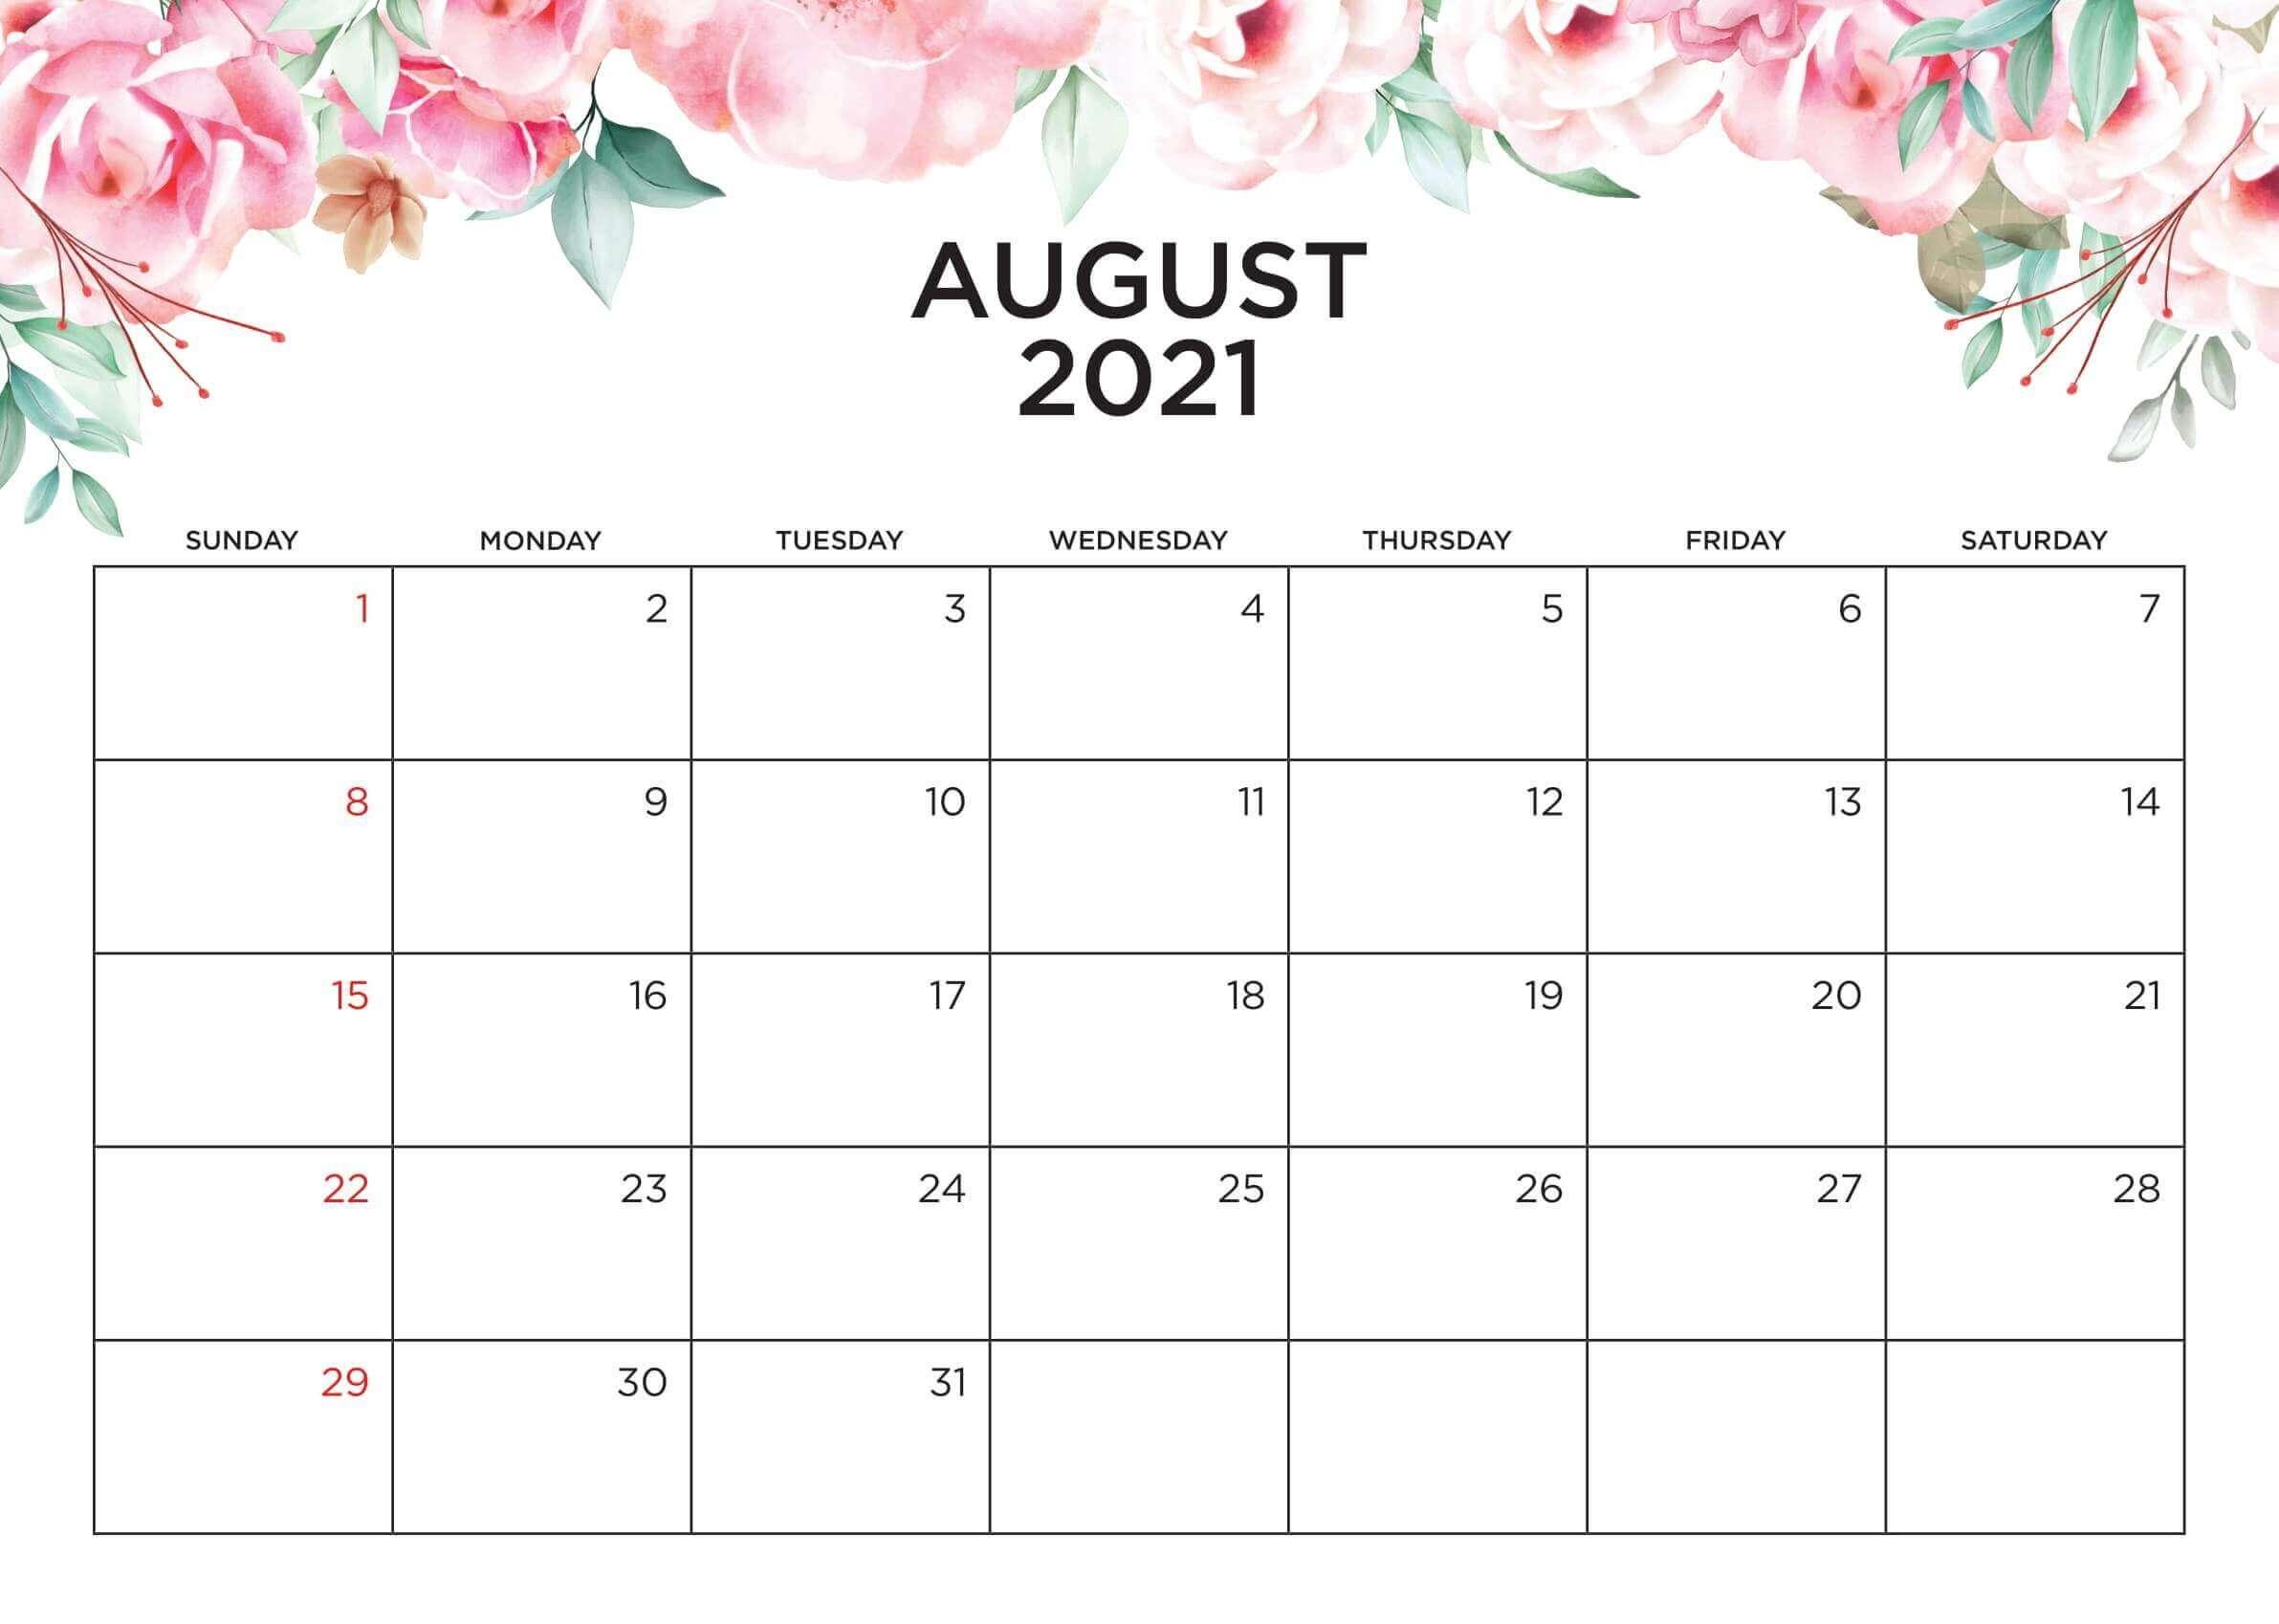 Cute August 2021 Calendar Wallpaper For Desk | Floral August Calendar 2021 Wall Designs For Desktop